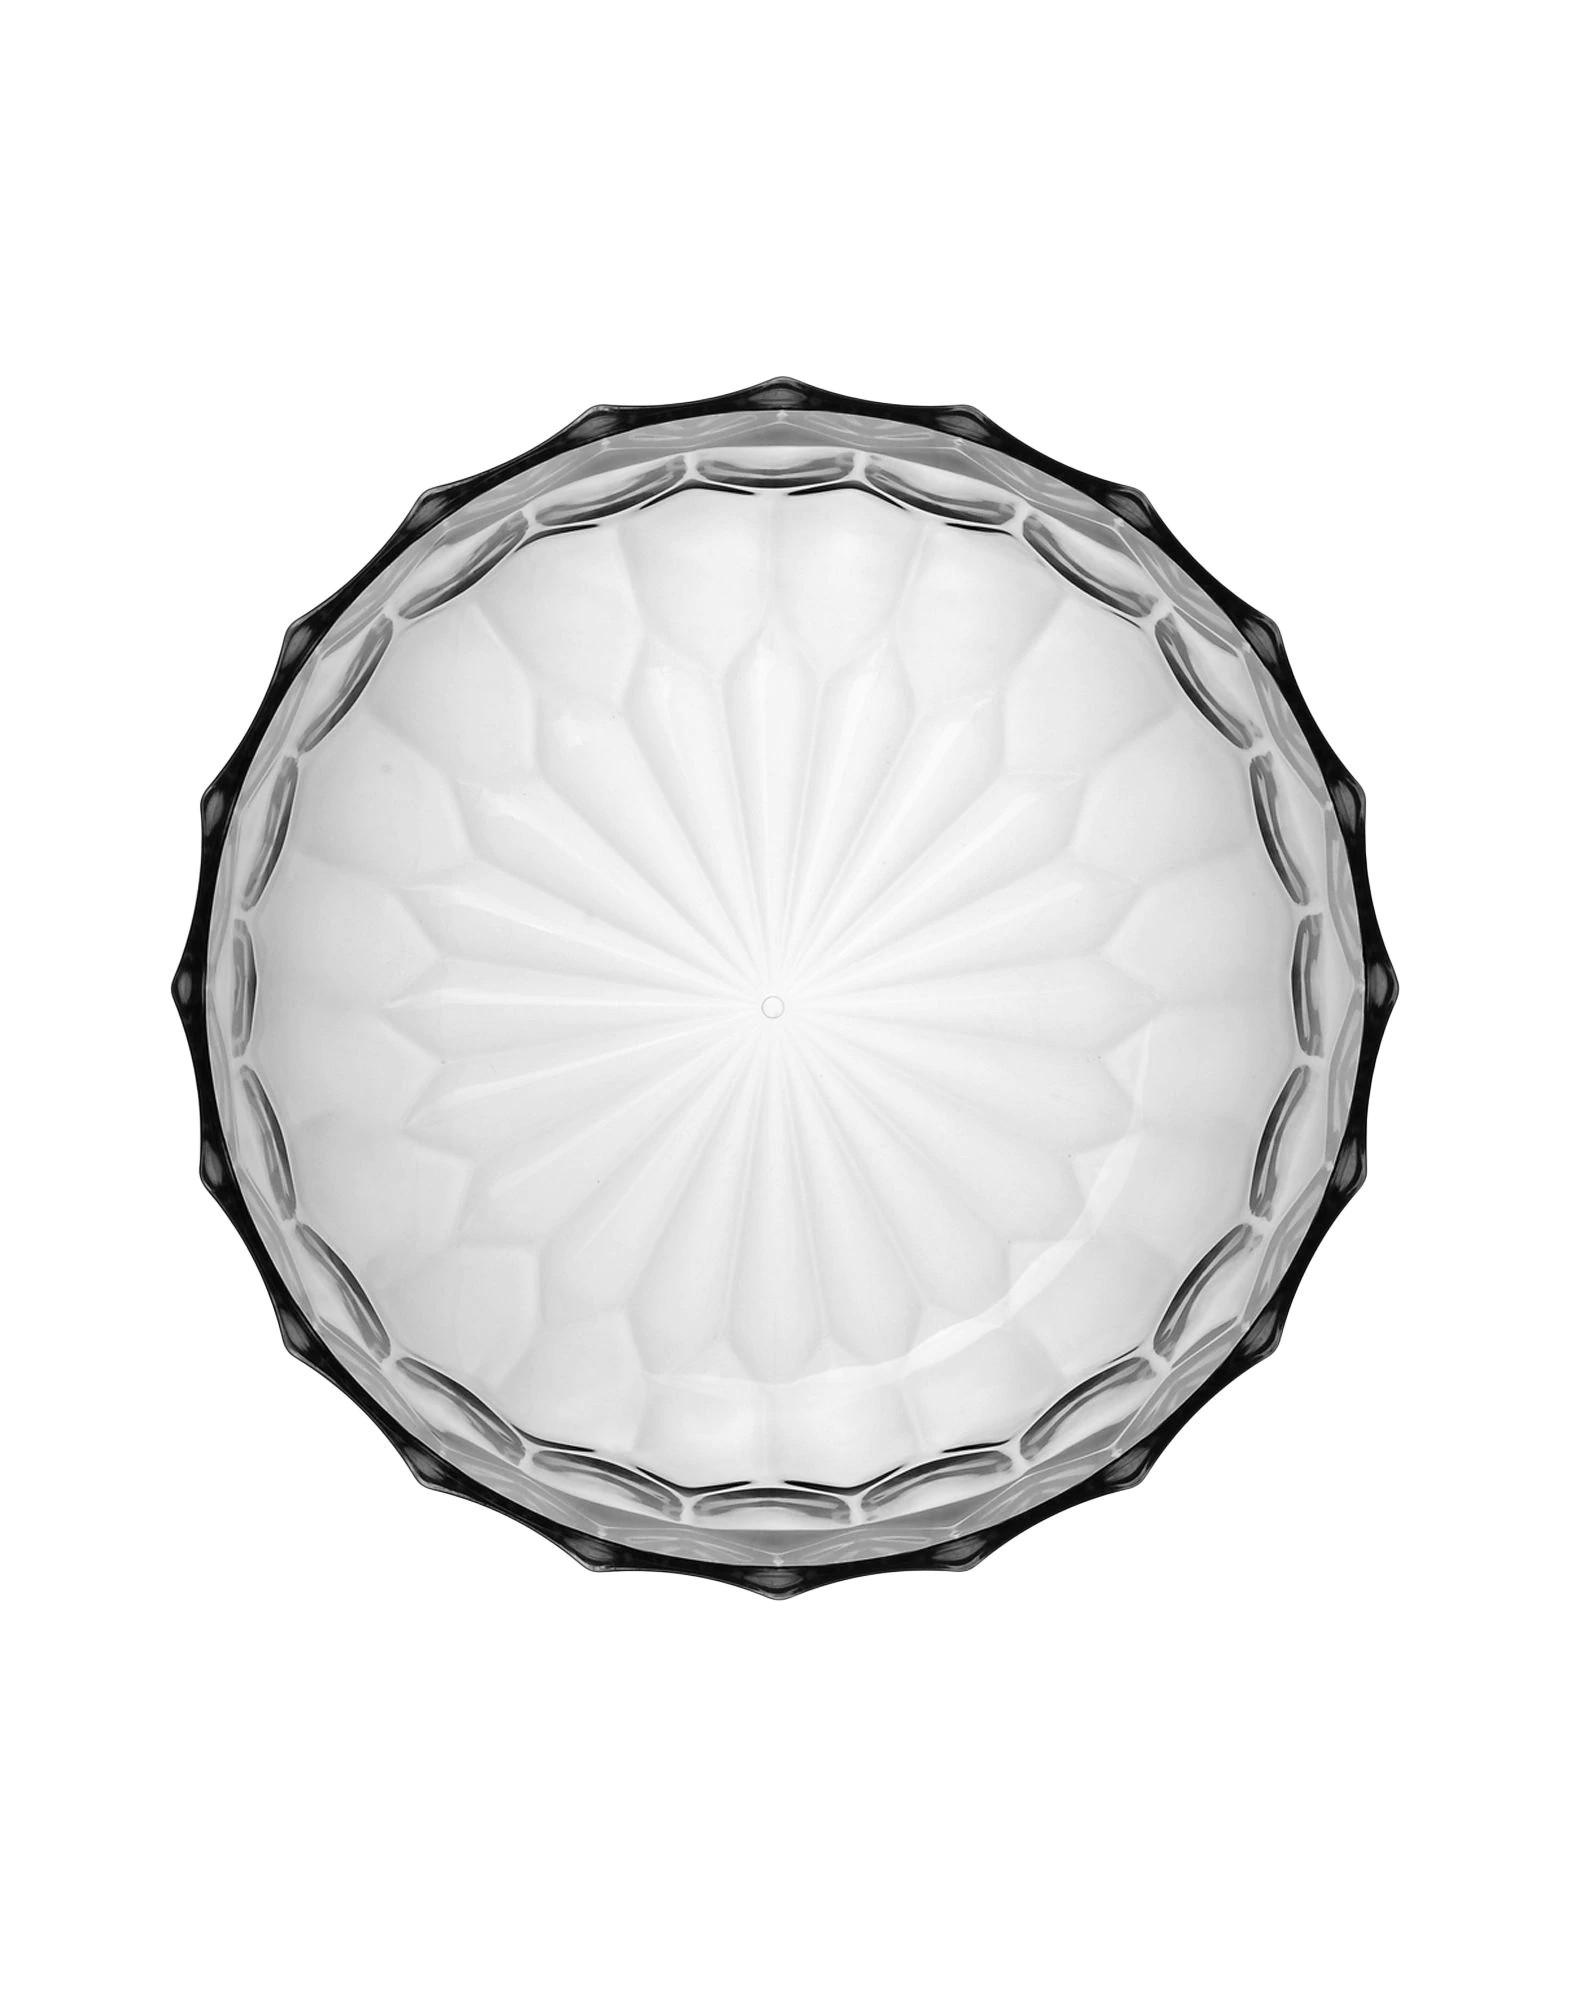 Kartell Jellies Family Salad Bowl Crystal 3